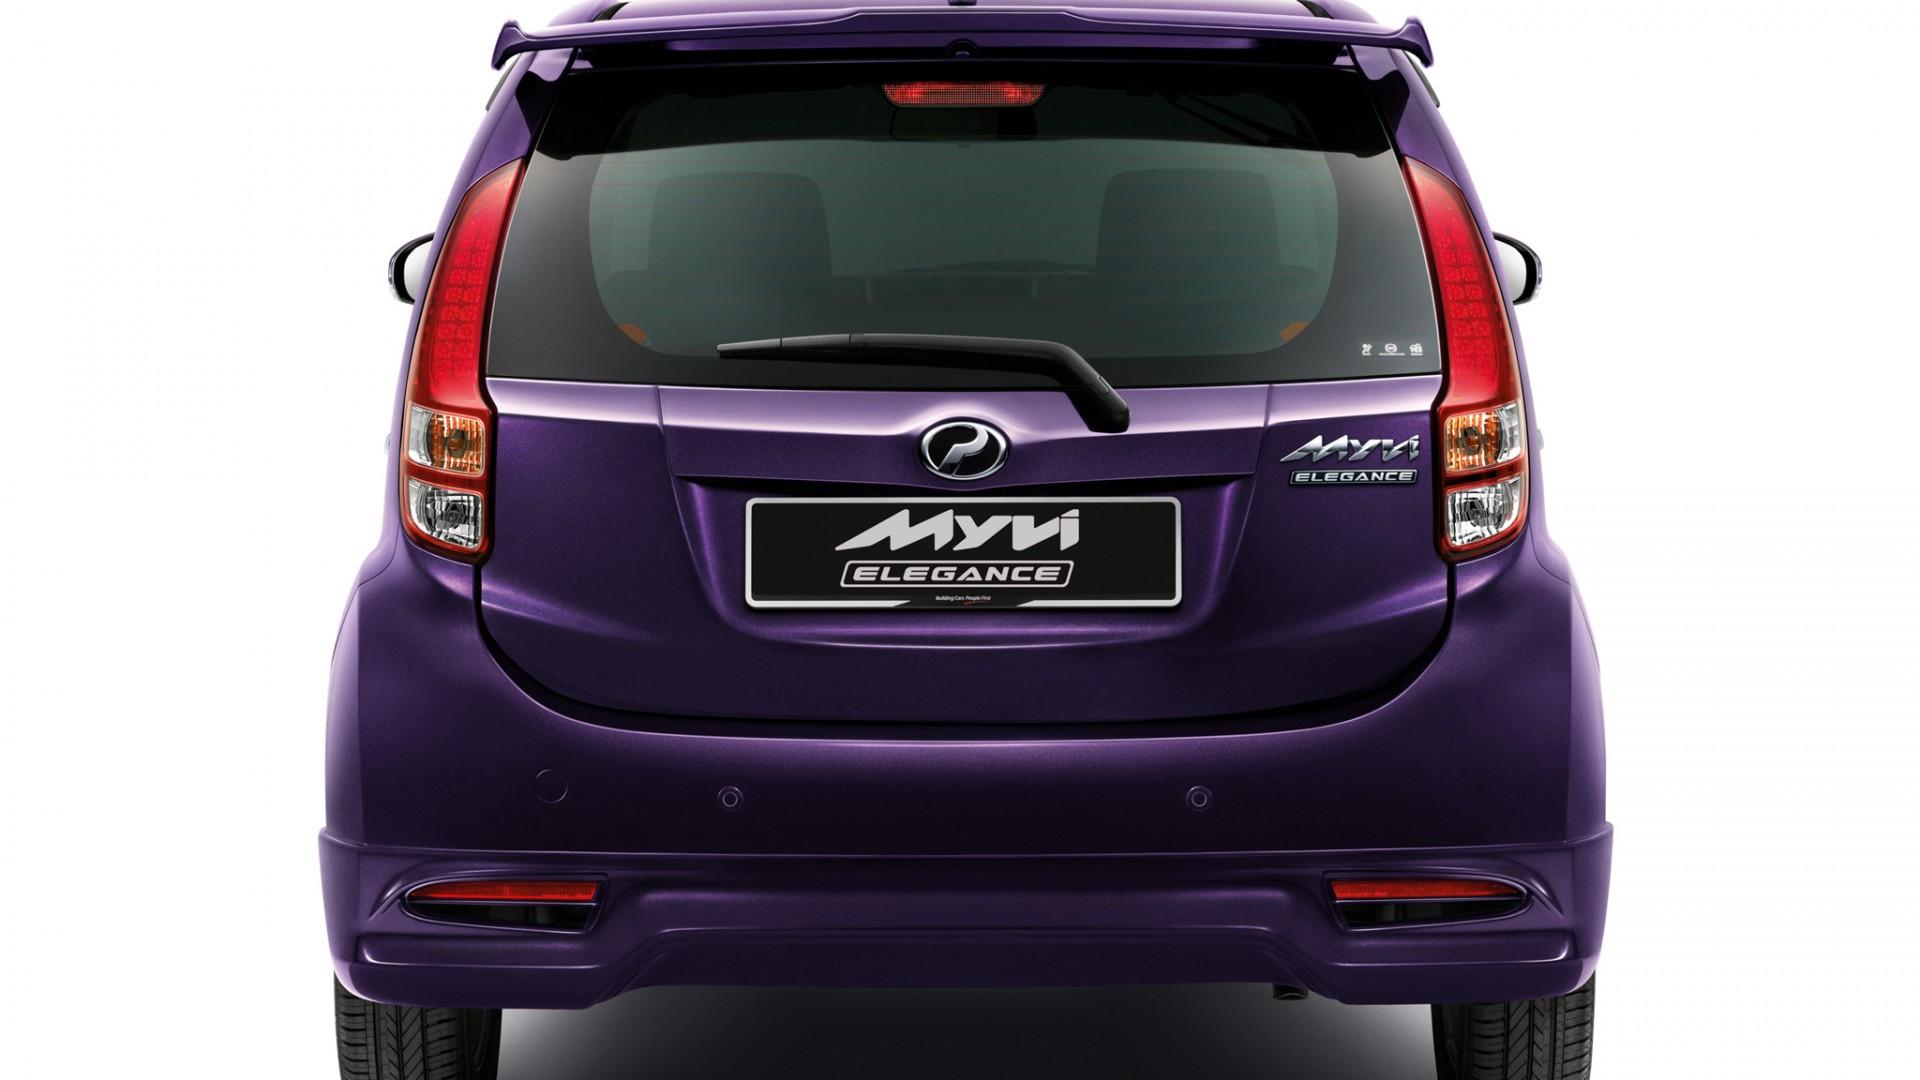 2011 Perodua MyVi Elegance rear   Car  free download HD Wallpaper